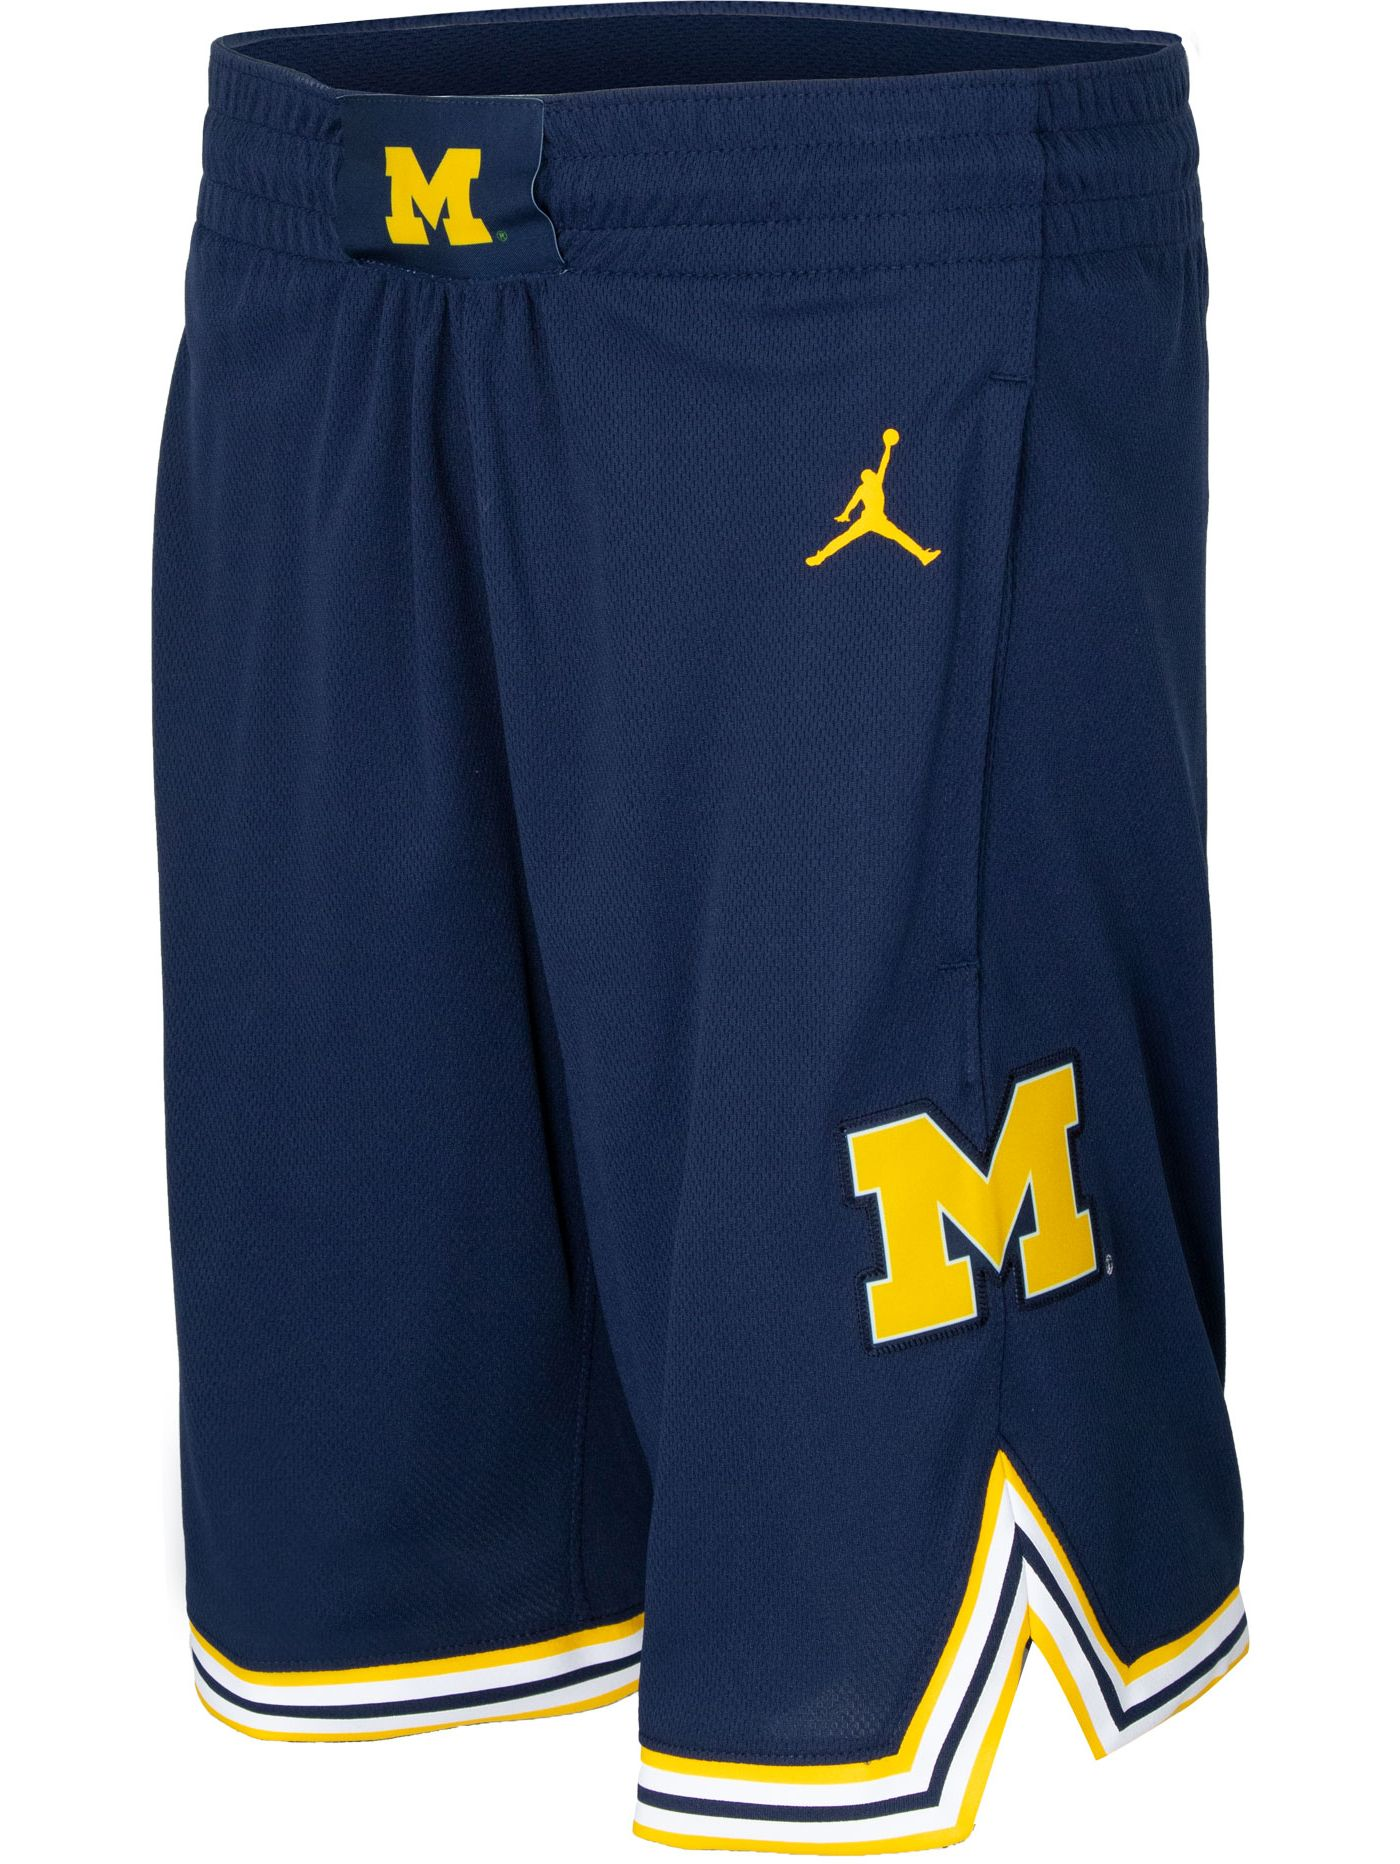 Jordan Youth Michigan Wolverines Blue Basketball Shorts